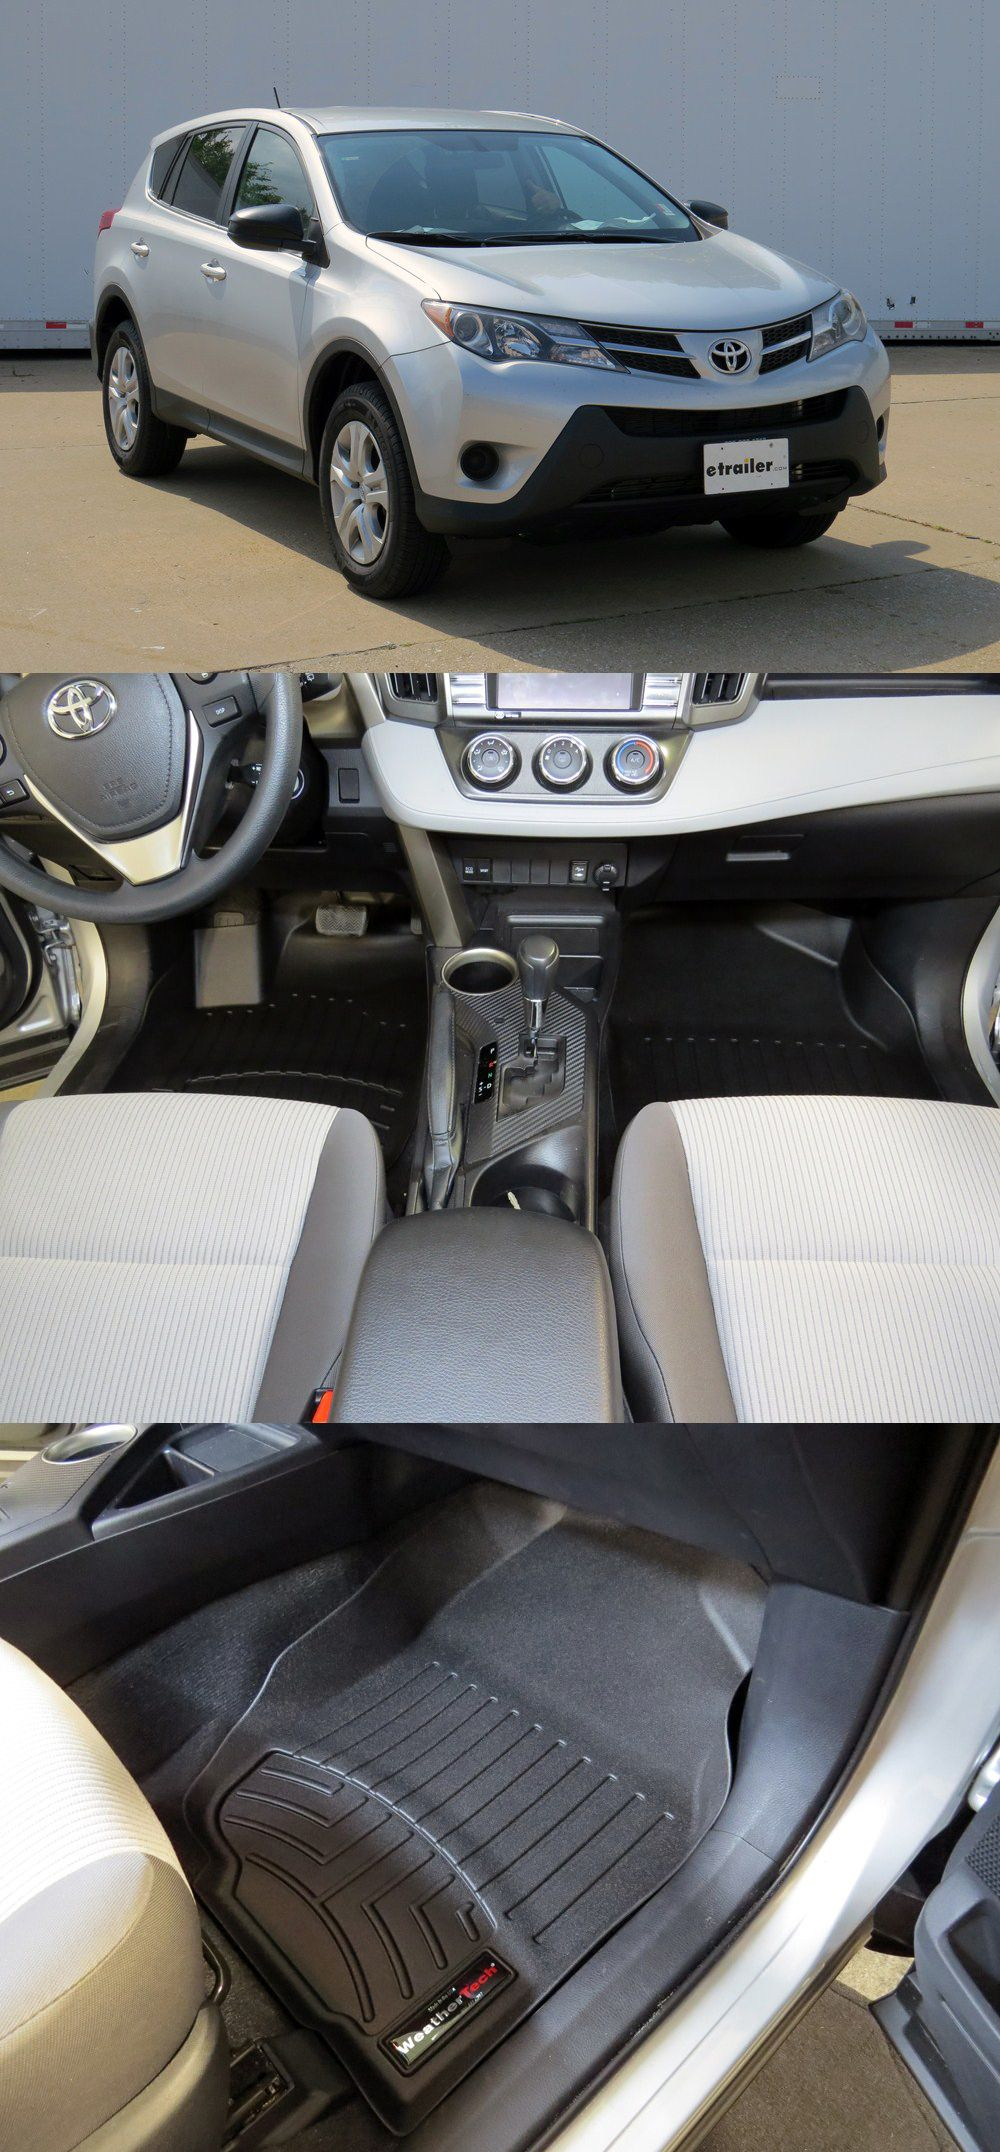 Weathertech floor mats okc - Keep The Inside Of Your Toyota Rav4 Clean With The Weathertech Floor Mats Unique